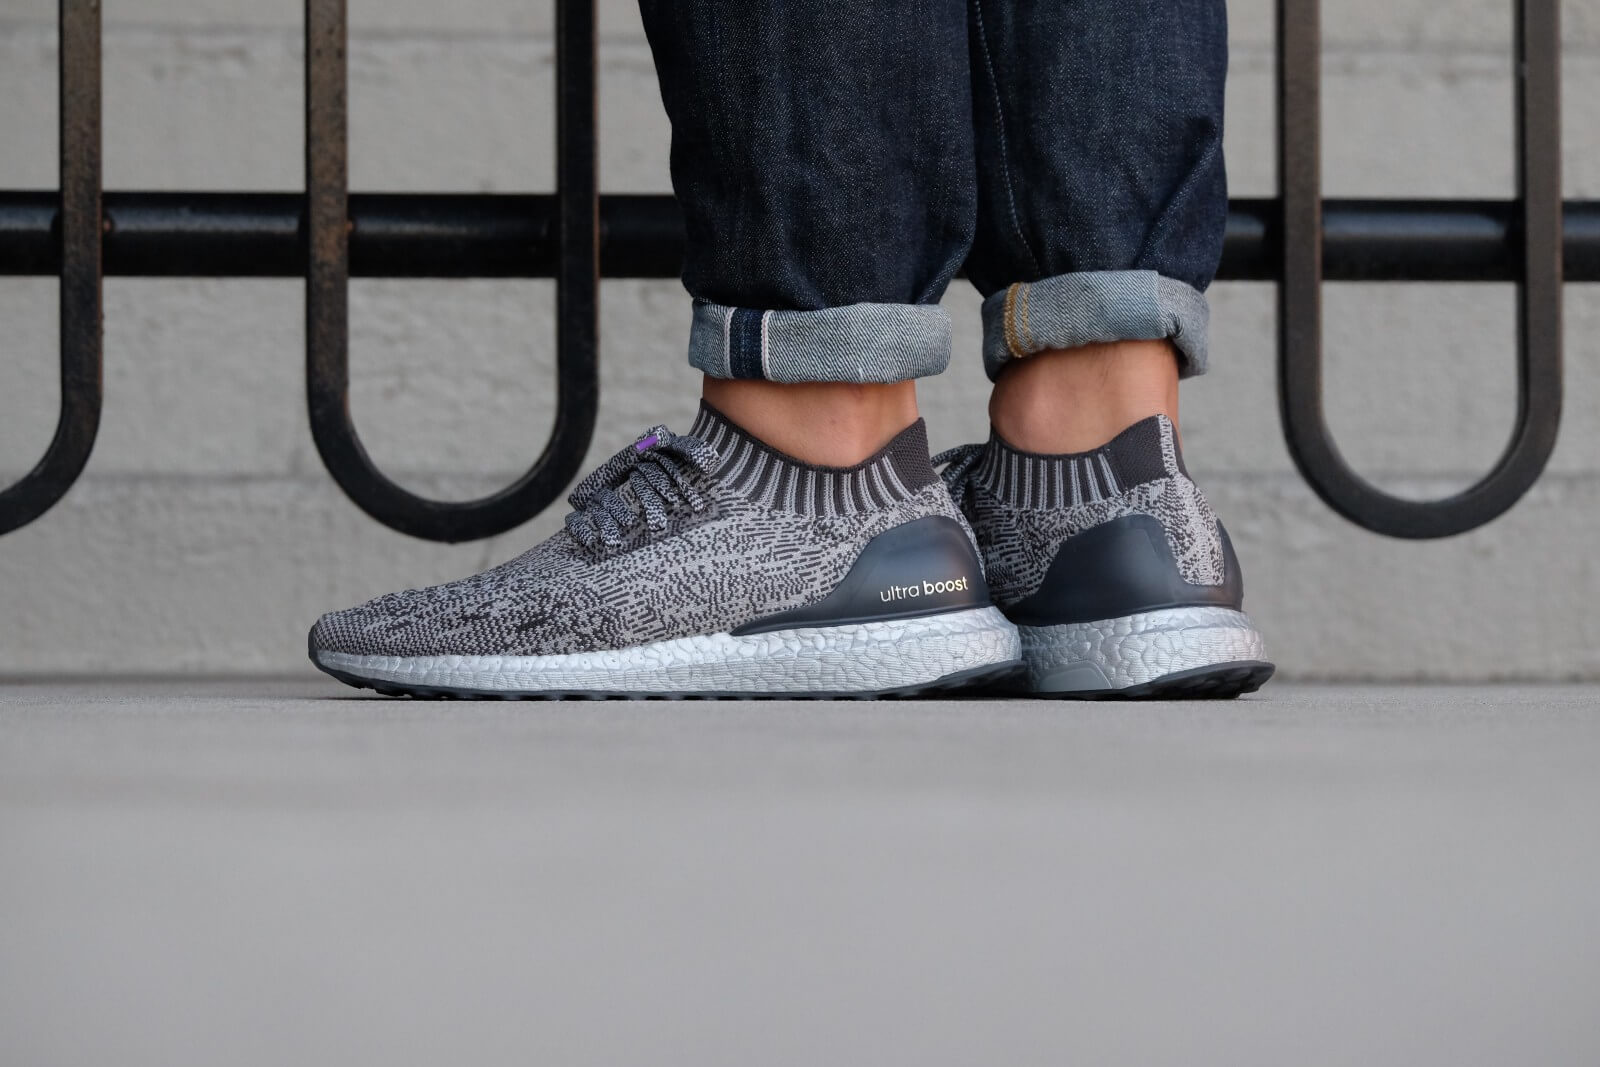 Adidas Ultra Boost Uncaged Solid Grey Silver Metallic BA7997